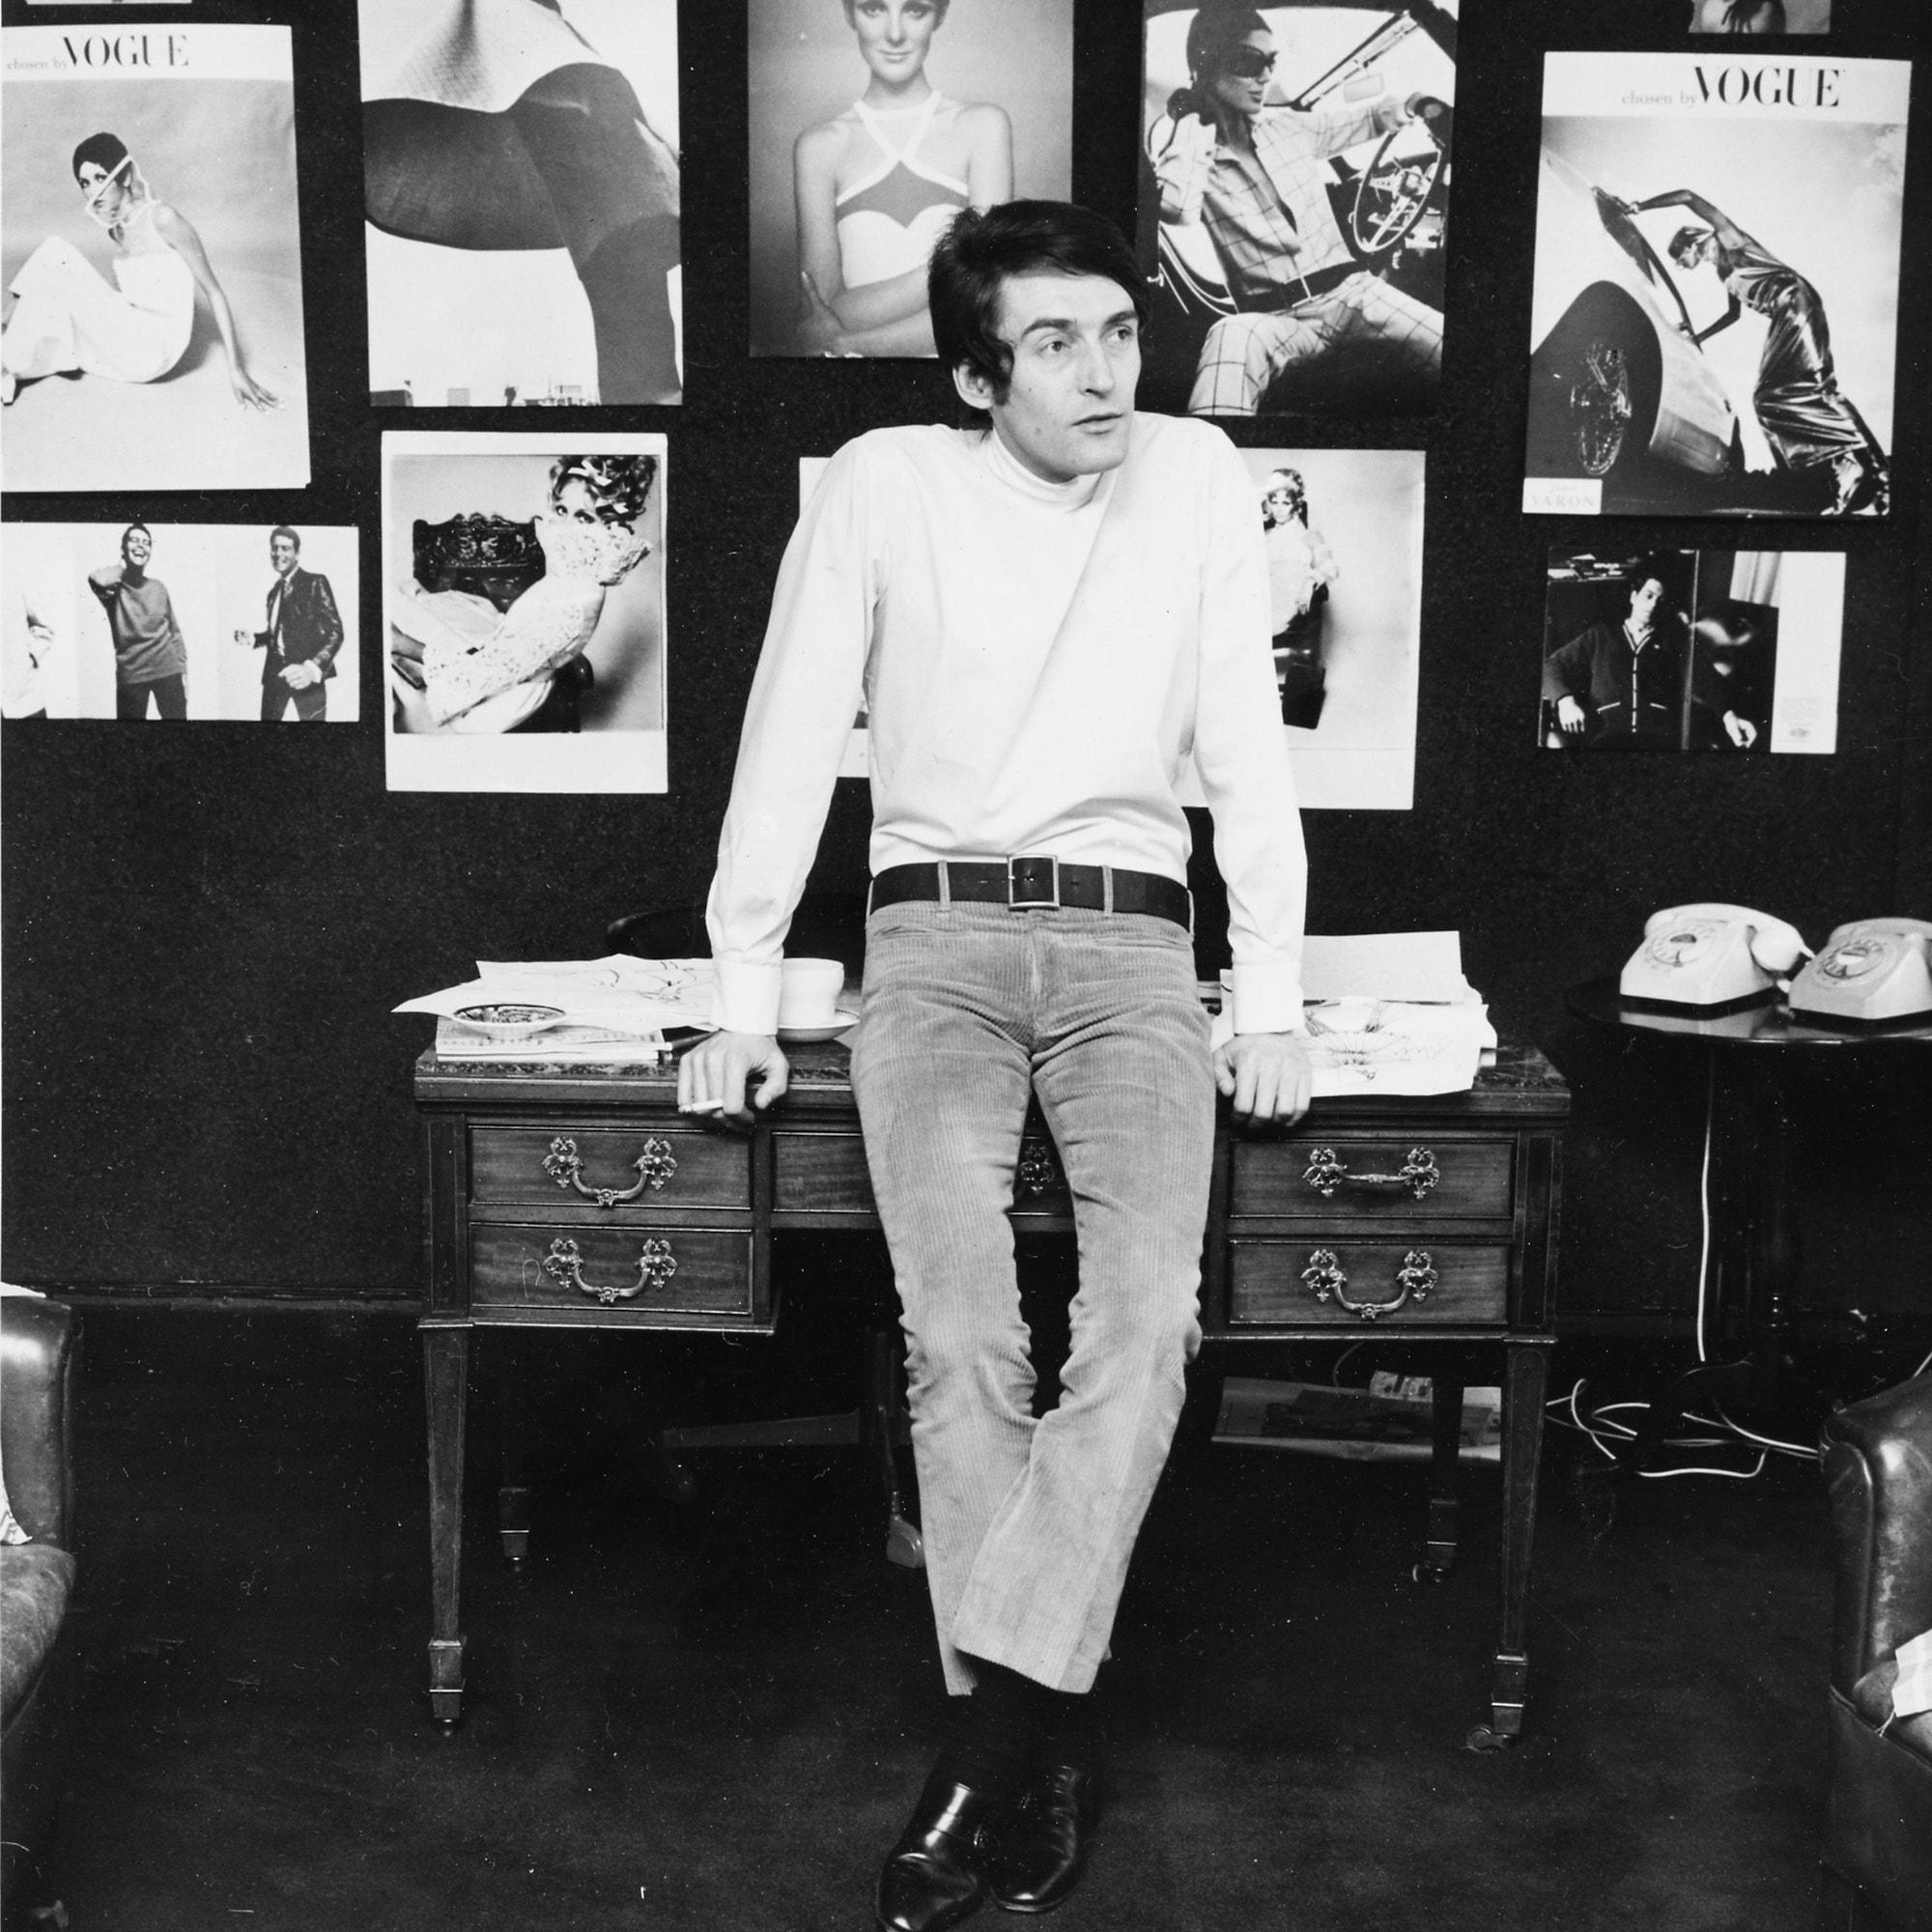 Jean Bates in his studio